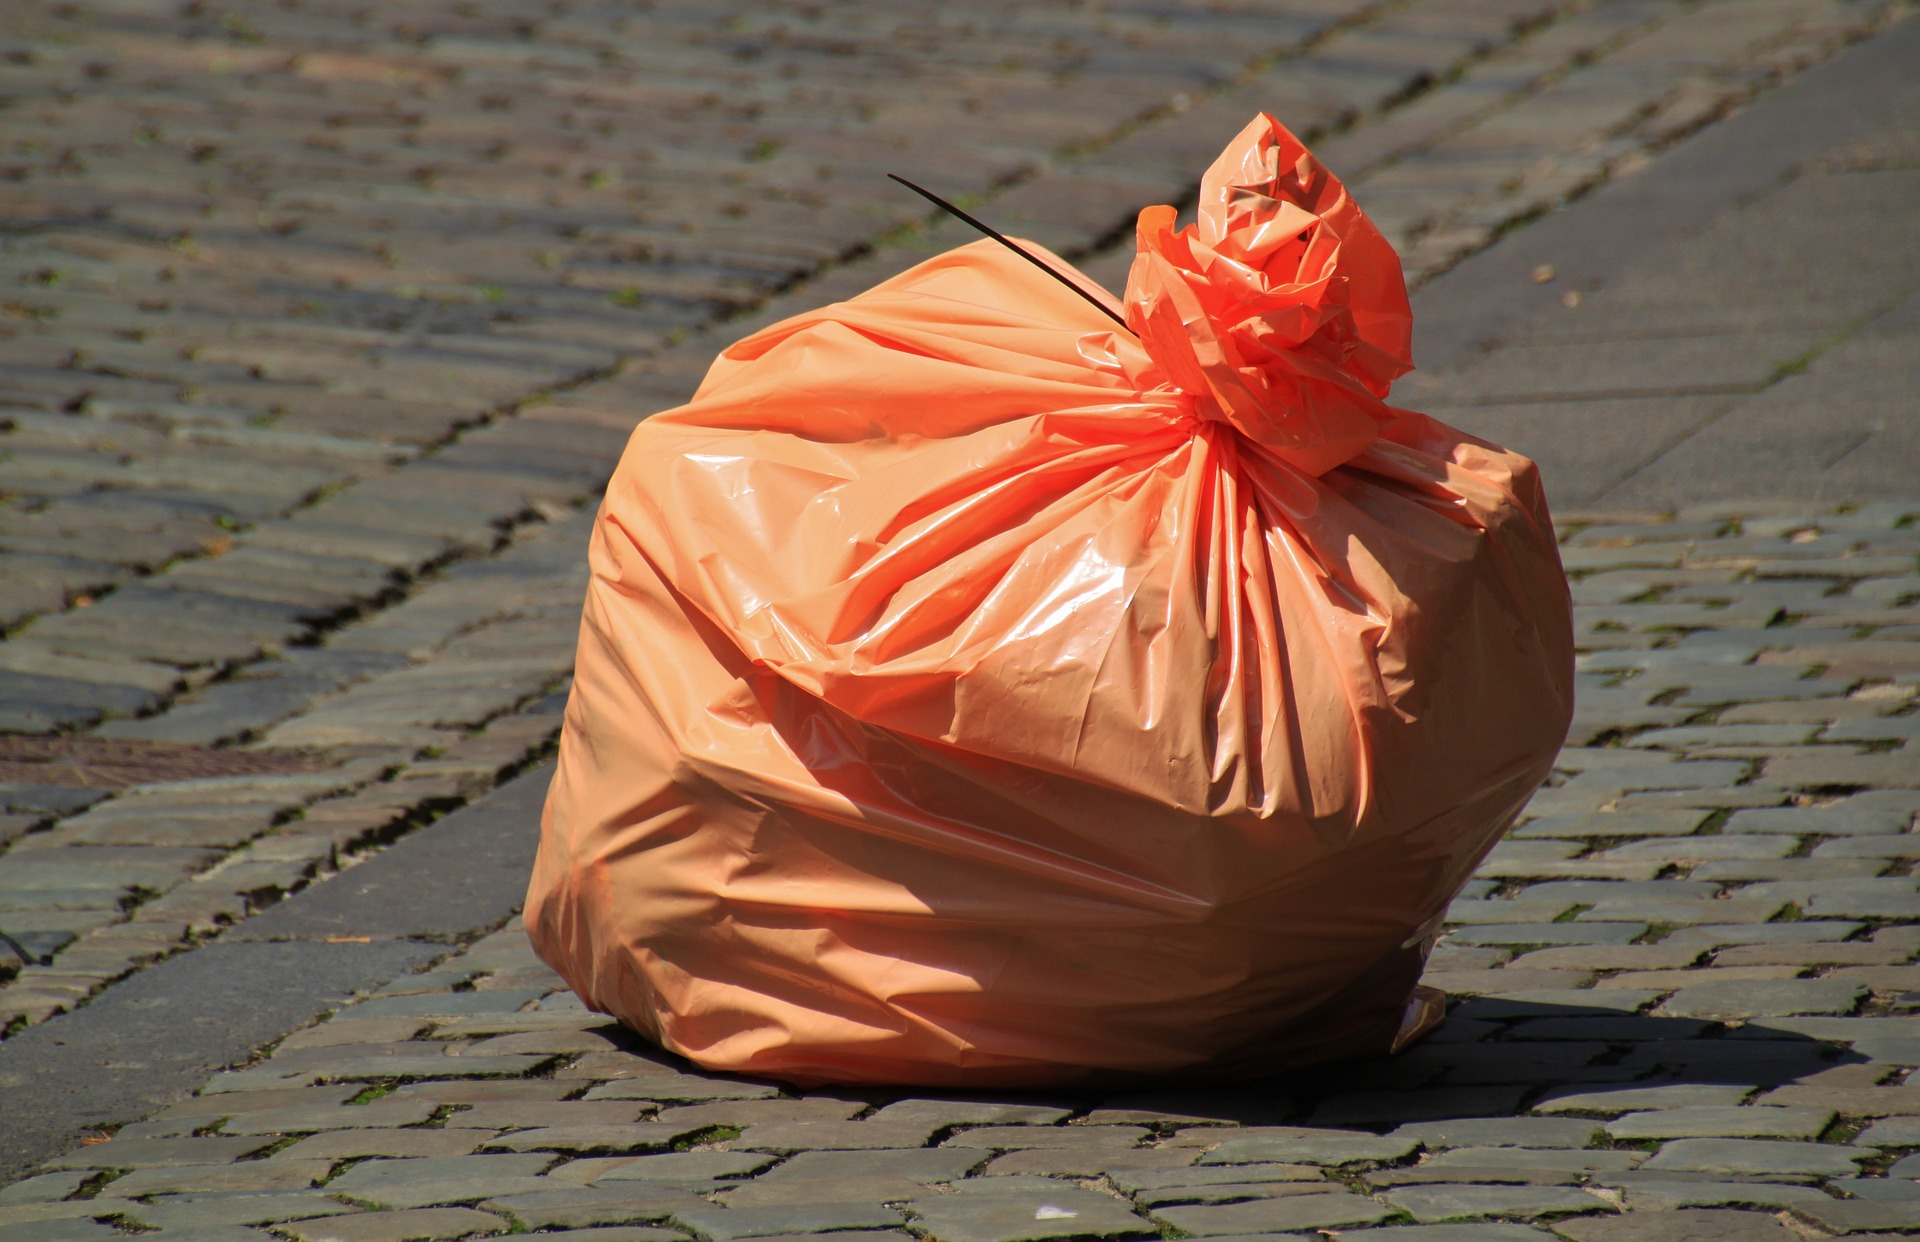 garbage-bag-850874_1920.jpg